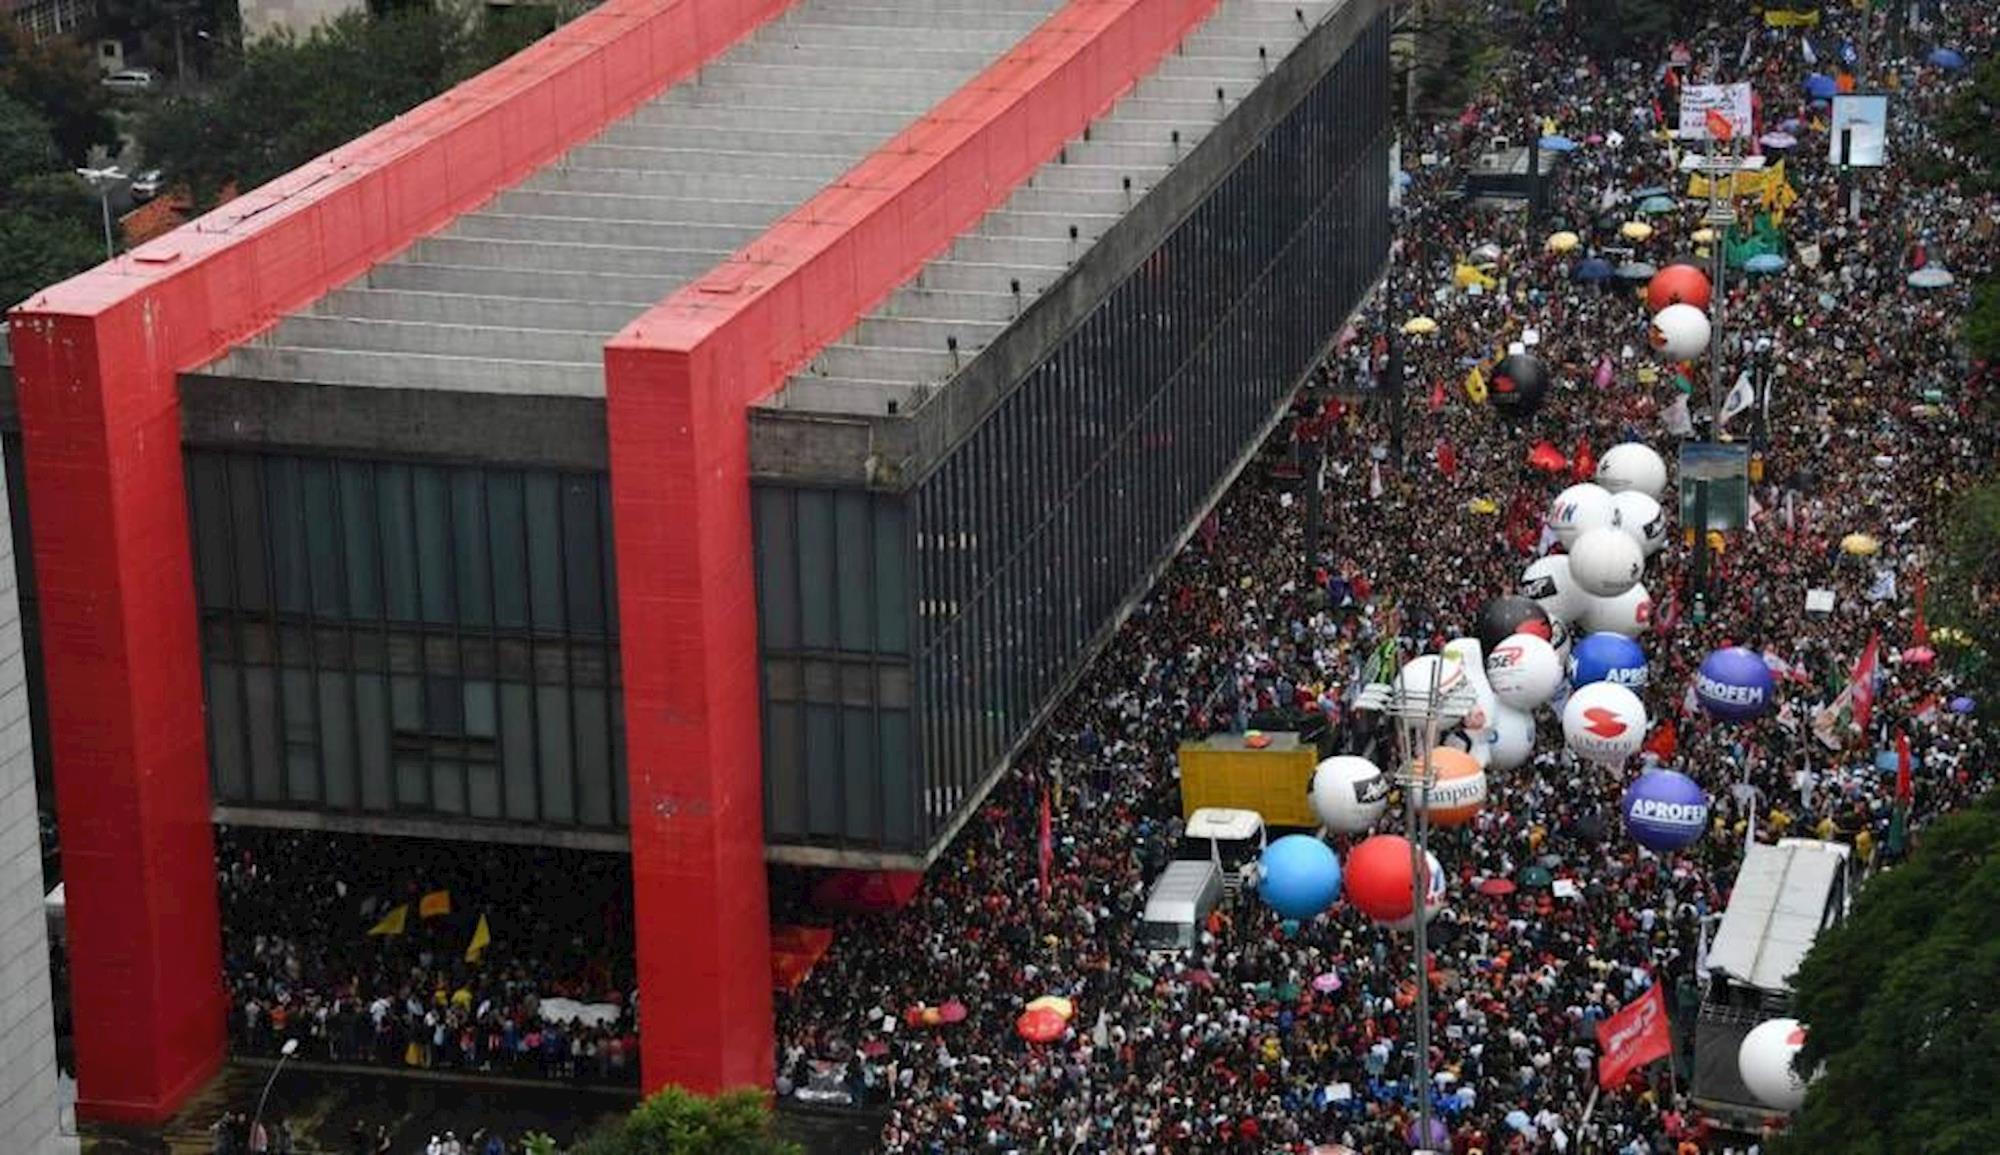 , NELSON ALMEIDA (AFP)